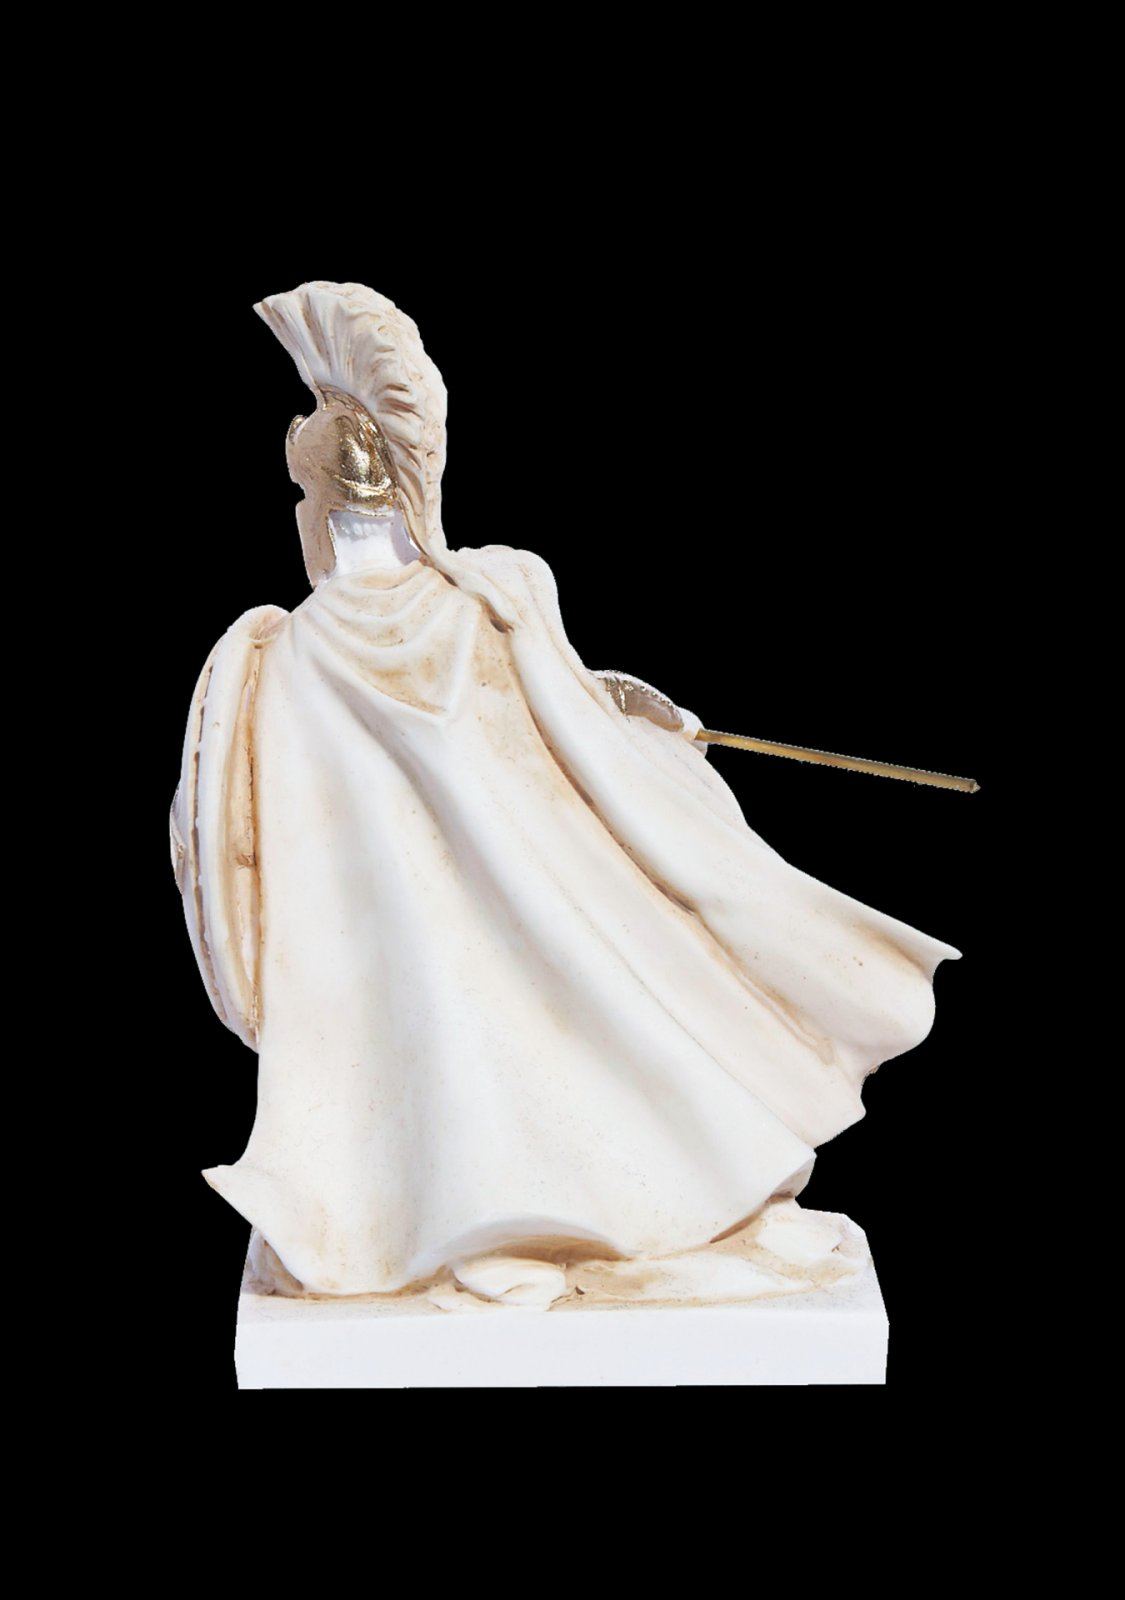 Leonidas Statue, King Of Sparta, Alabaster Sculpture